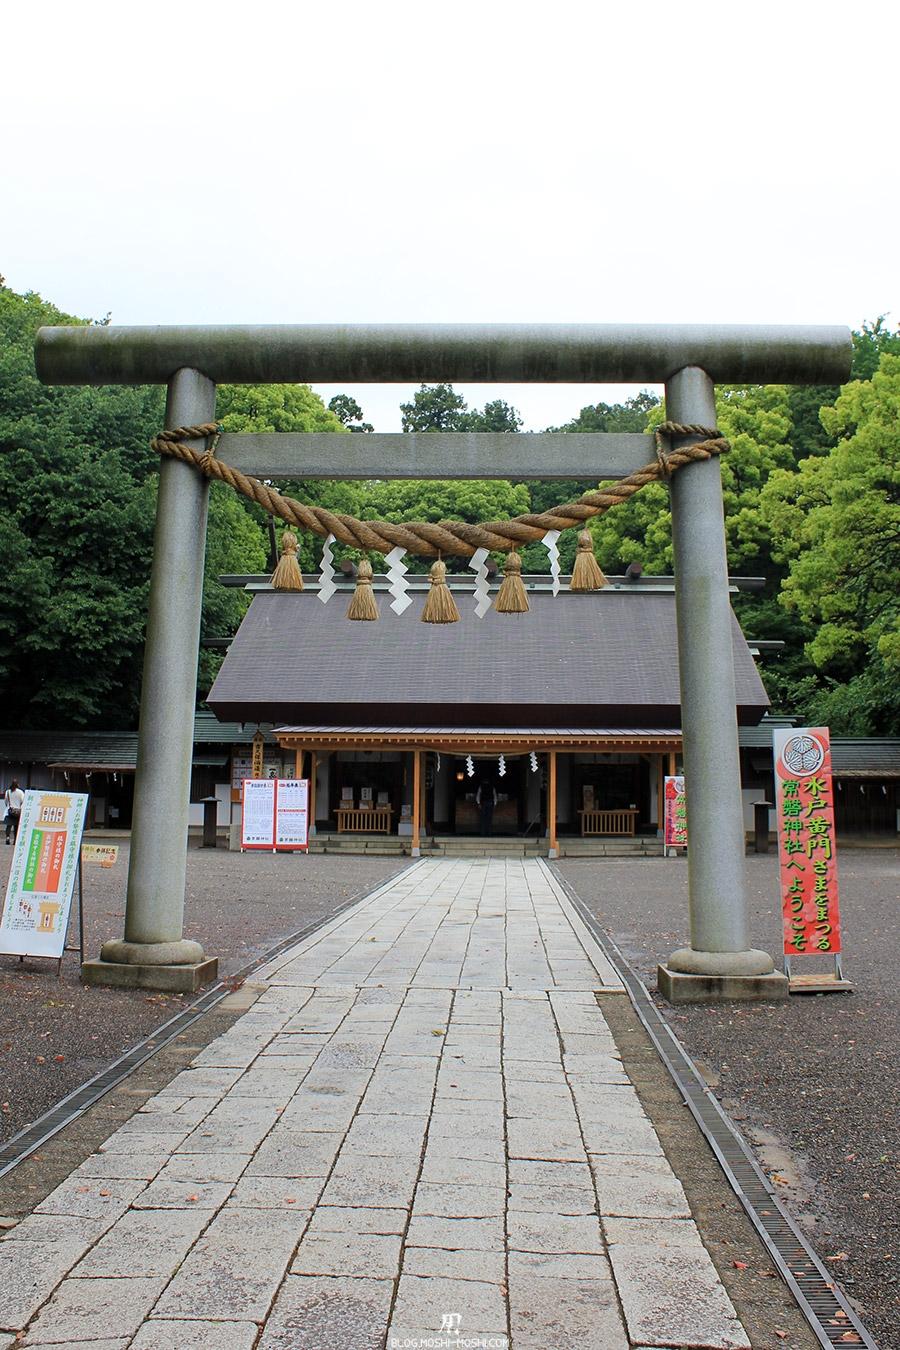 jardin-japonais-kairaku-en-sanctuaire-tokiwa-jinja-torii-pierre-pavillon